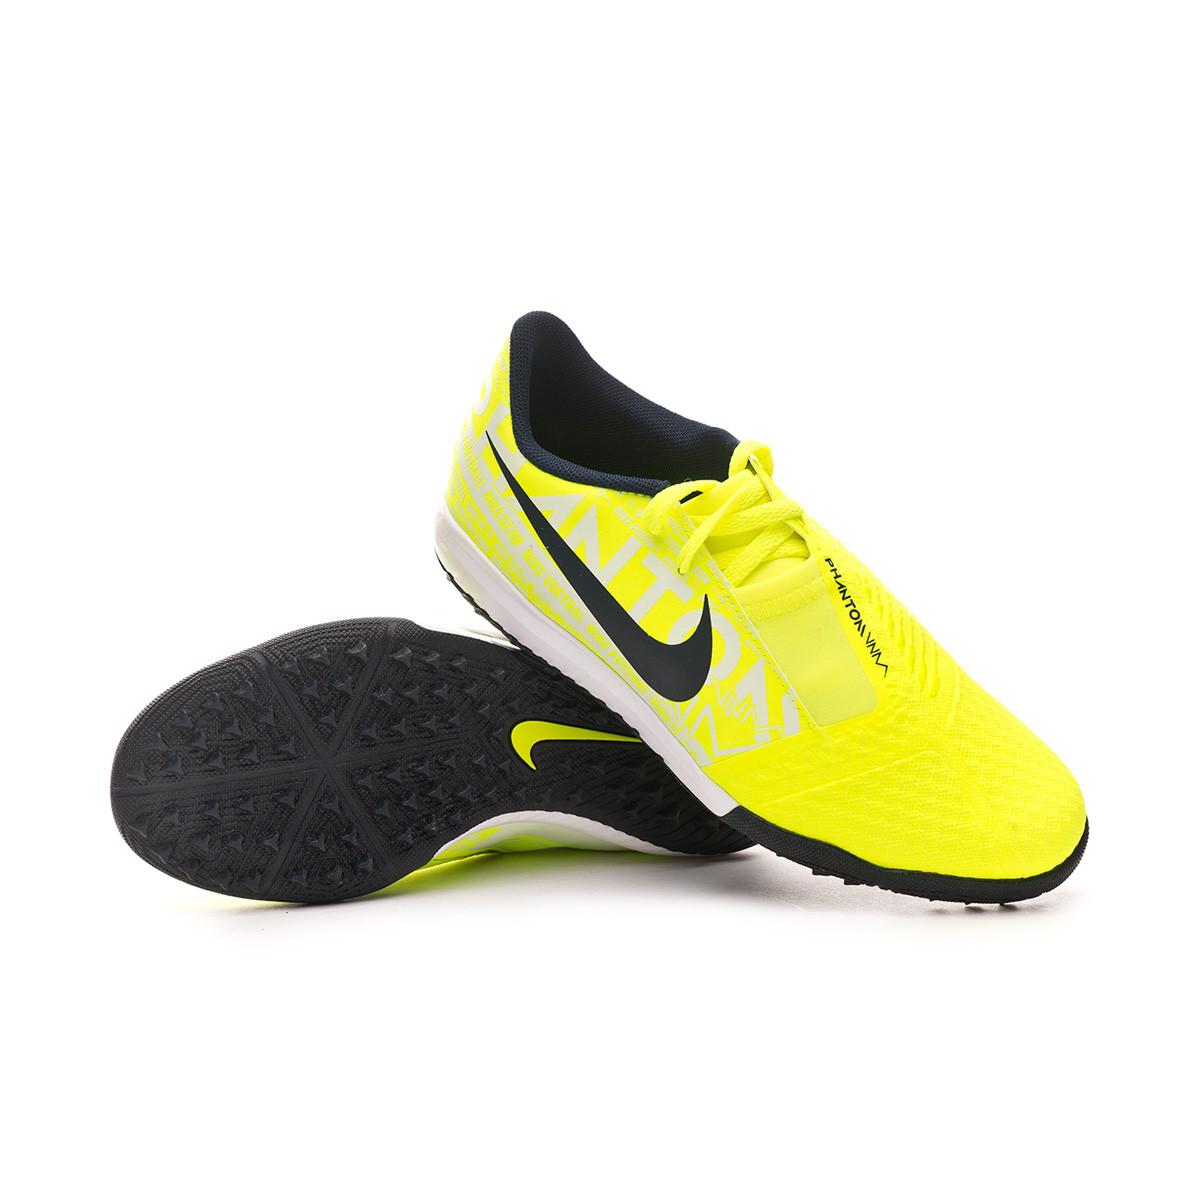 violencia seré fuerte Sueño áspero  Football Boots Nike Phantom Venom Academy Turf Niño Volt-Obsidian -  Football store Fútbol Emotion